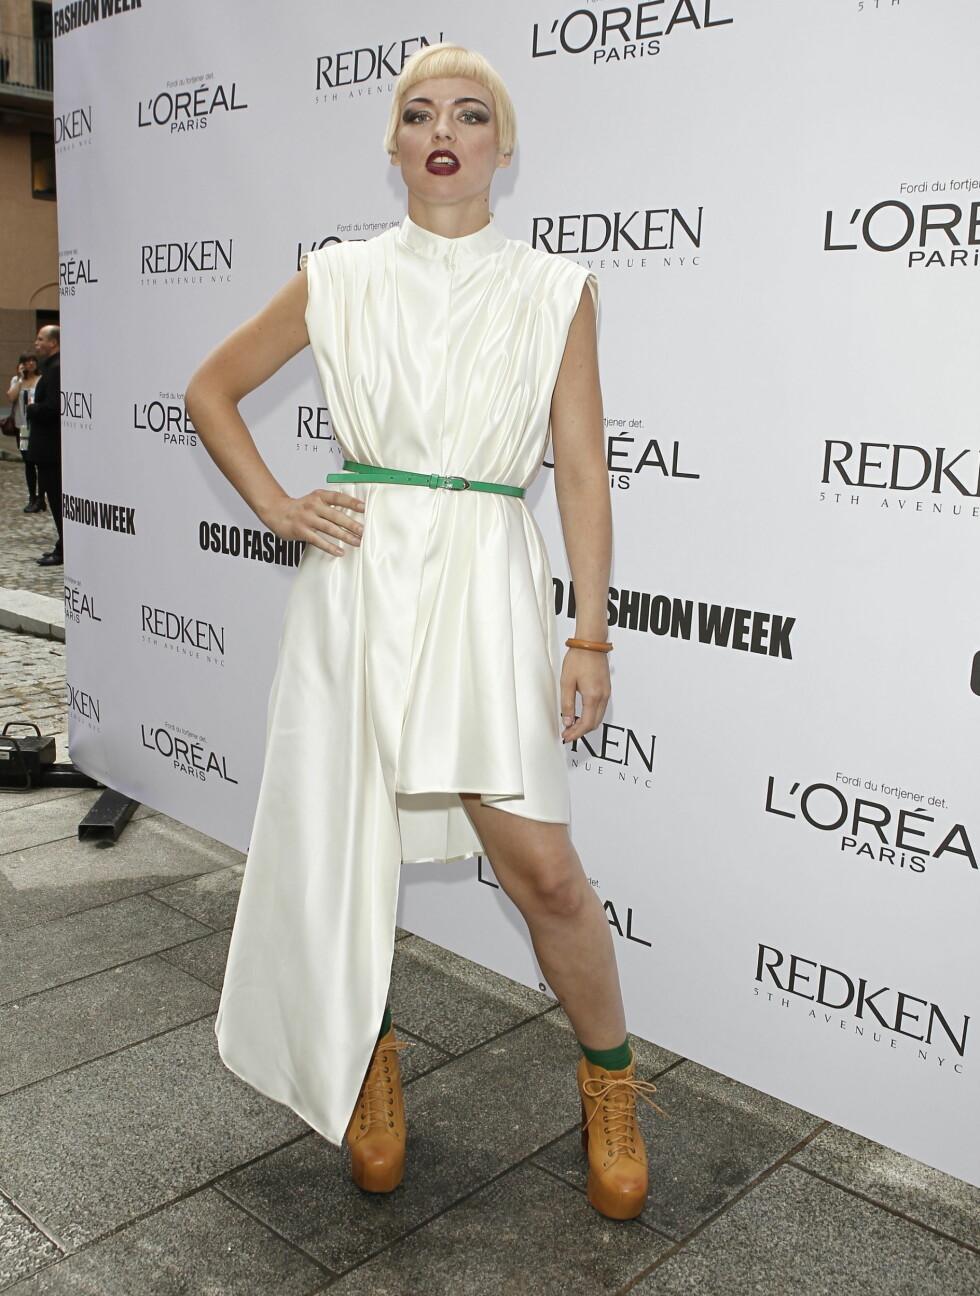 TRENDY: Mariann stilte i en trendy hvit kjole med rocka boots under åpningen av Oslo Fashion Week.  Foto: Stella Pictures